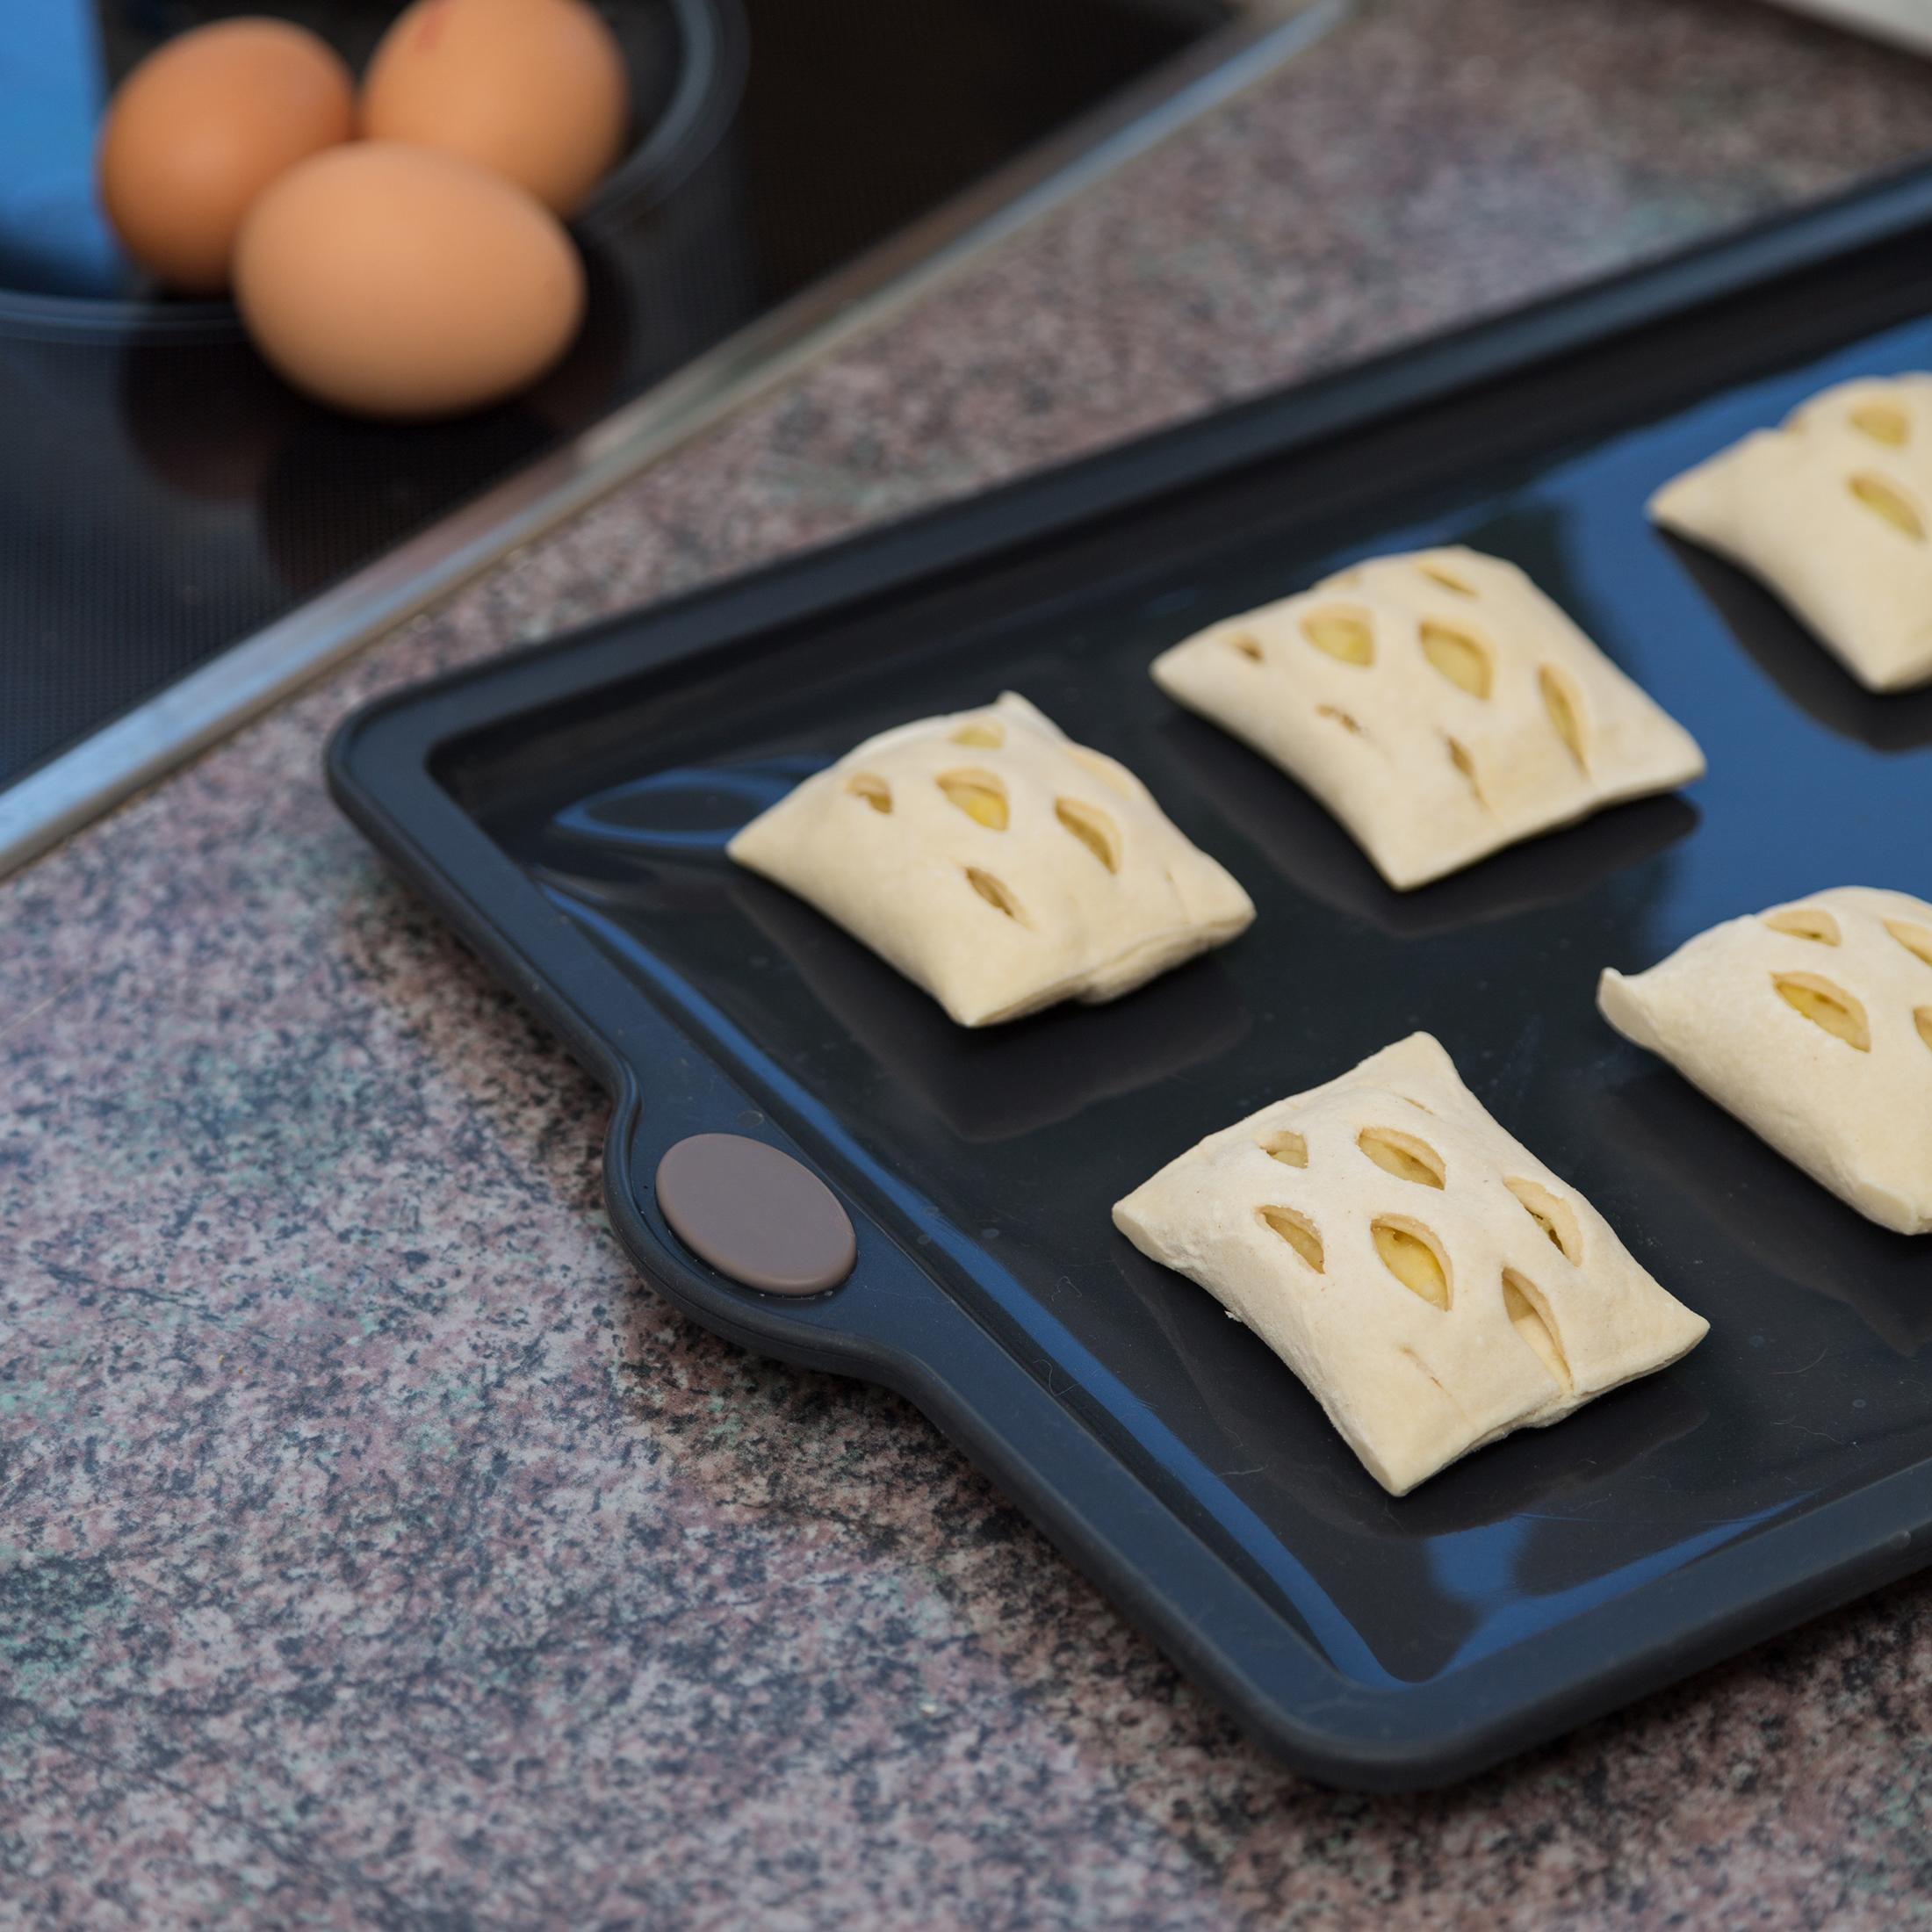 Levivo Silicone Baking Pan 26 X 20 Cm Non Stick Cake Pan